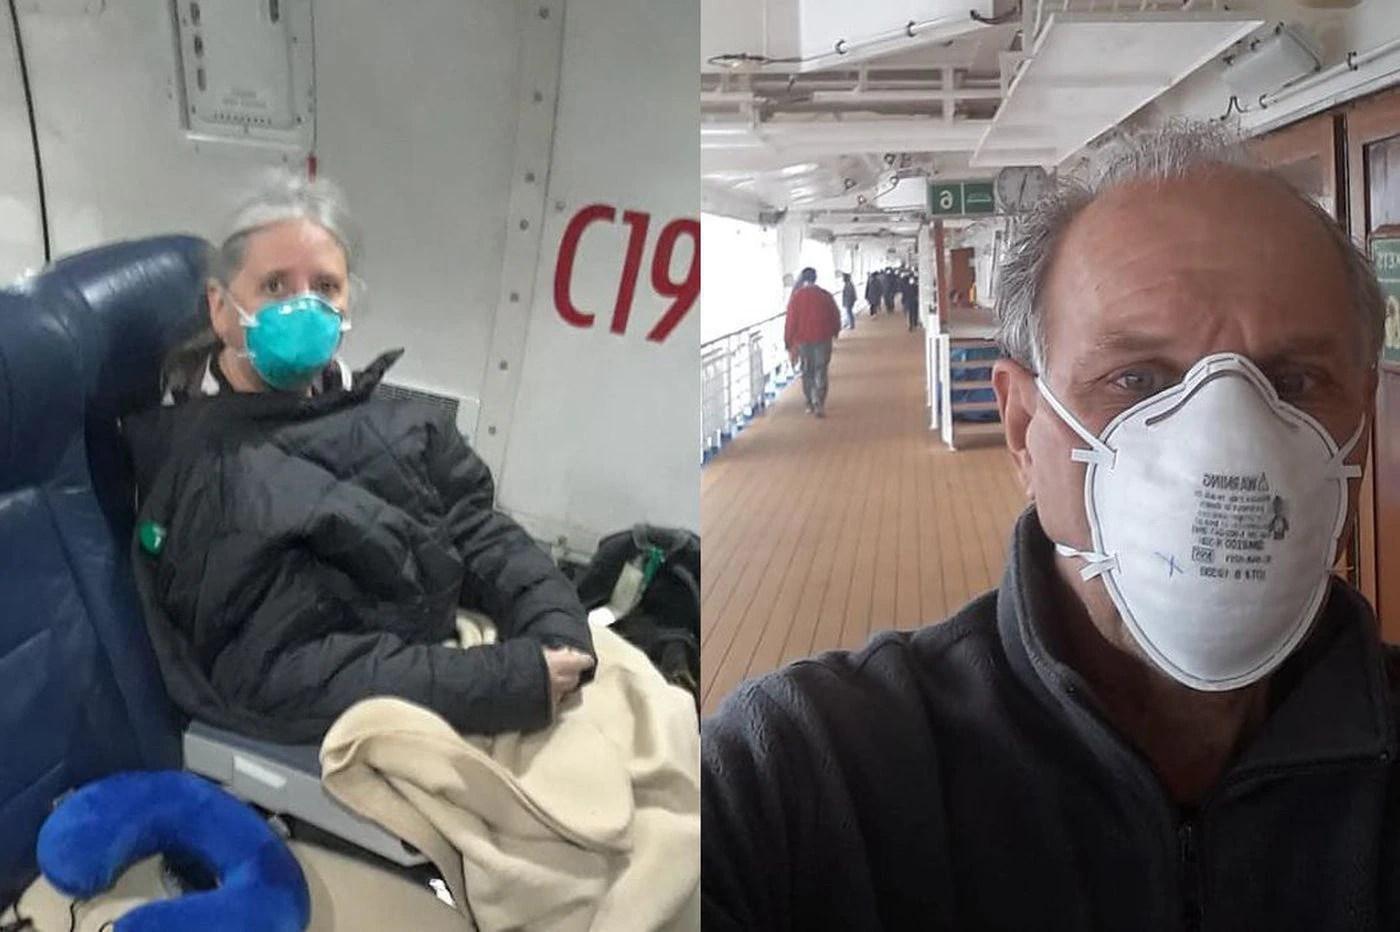 York County couple quarantined for coronavirus at U.S. Air Force ...